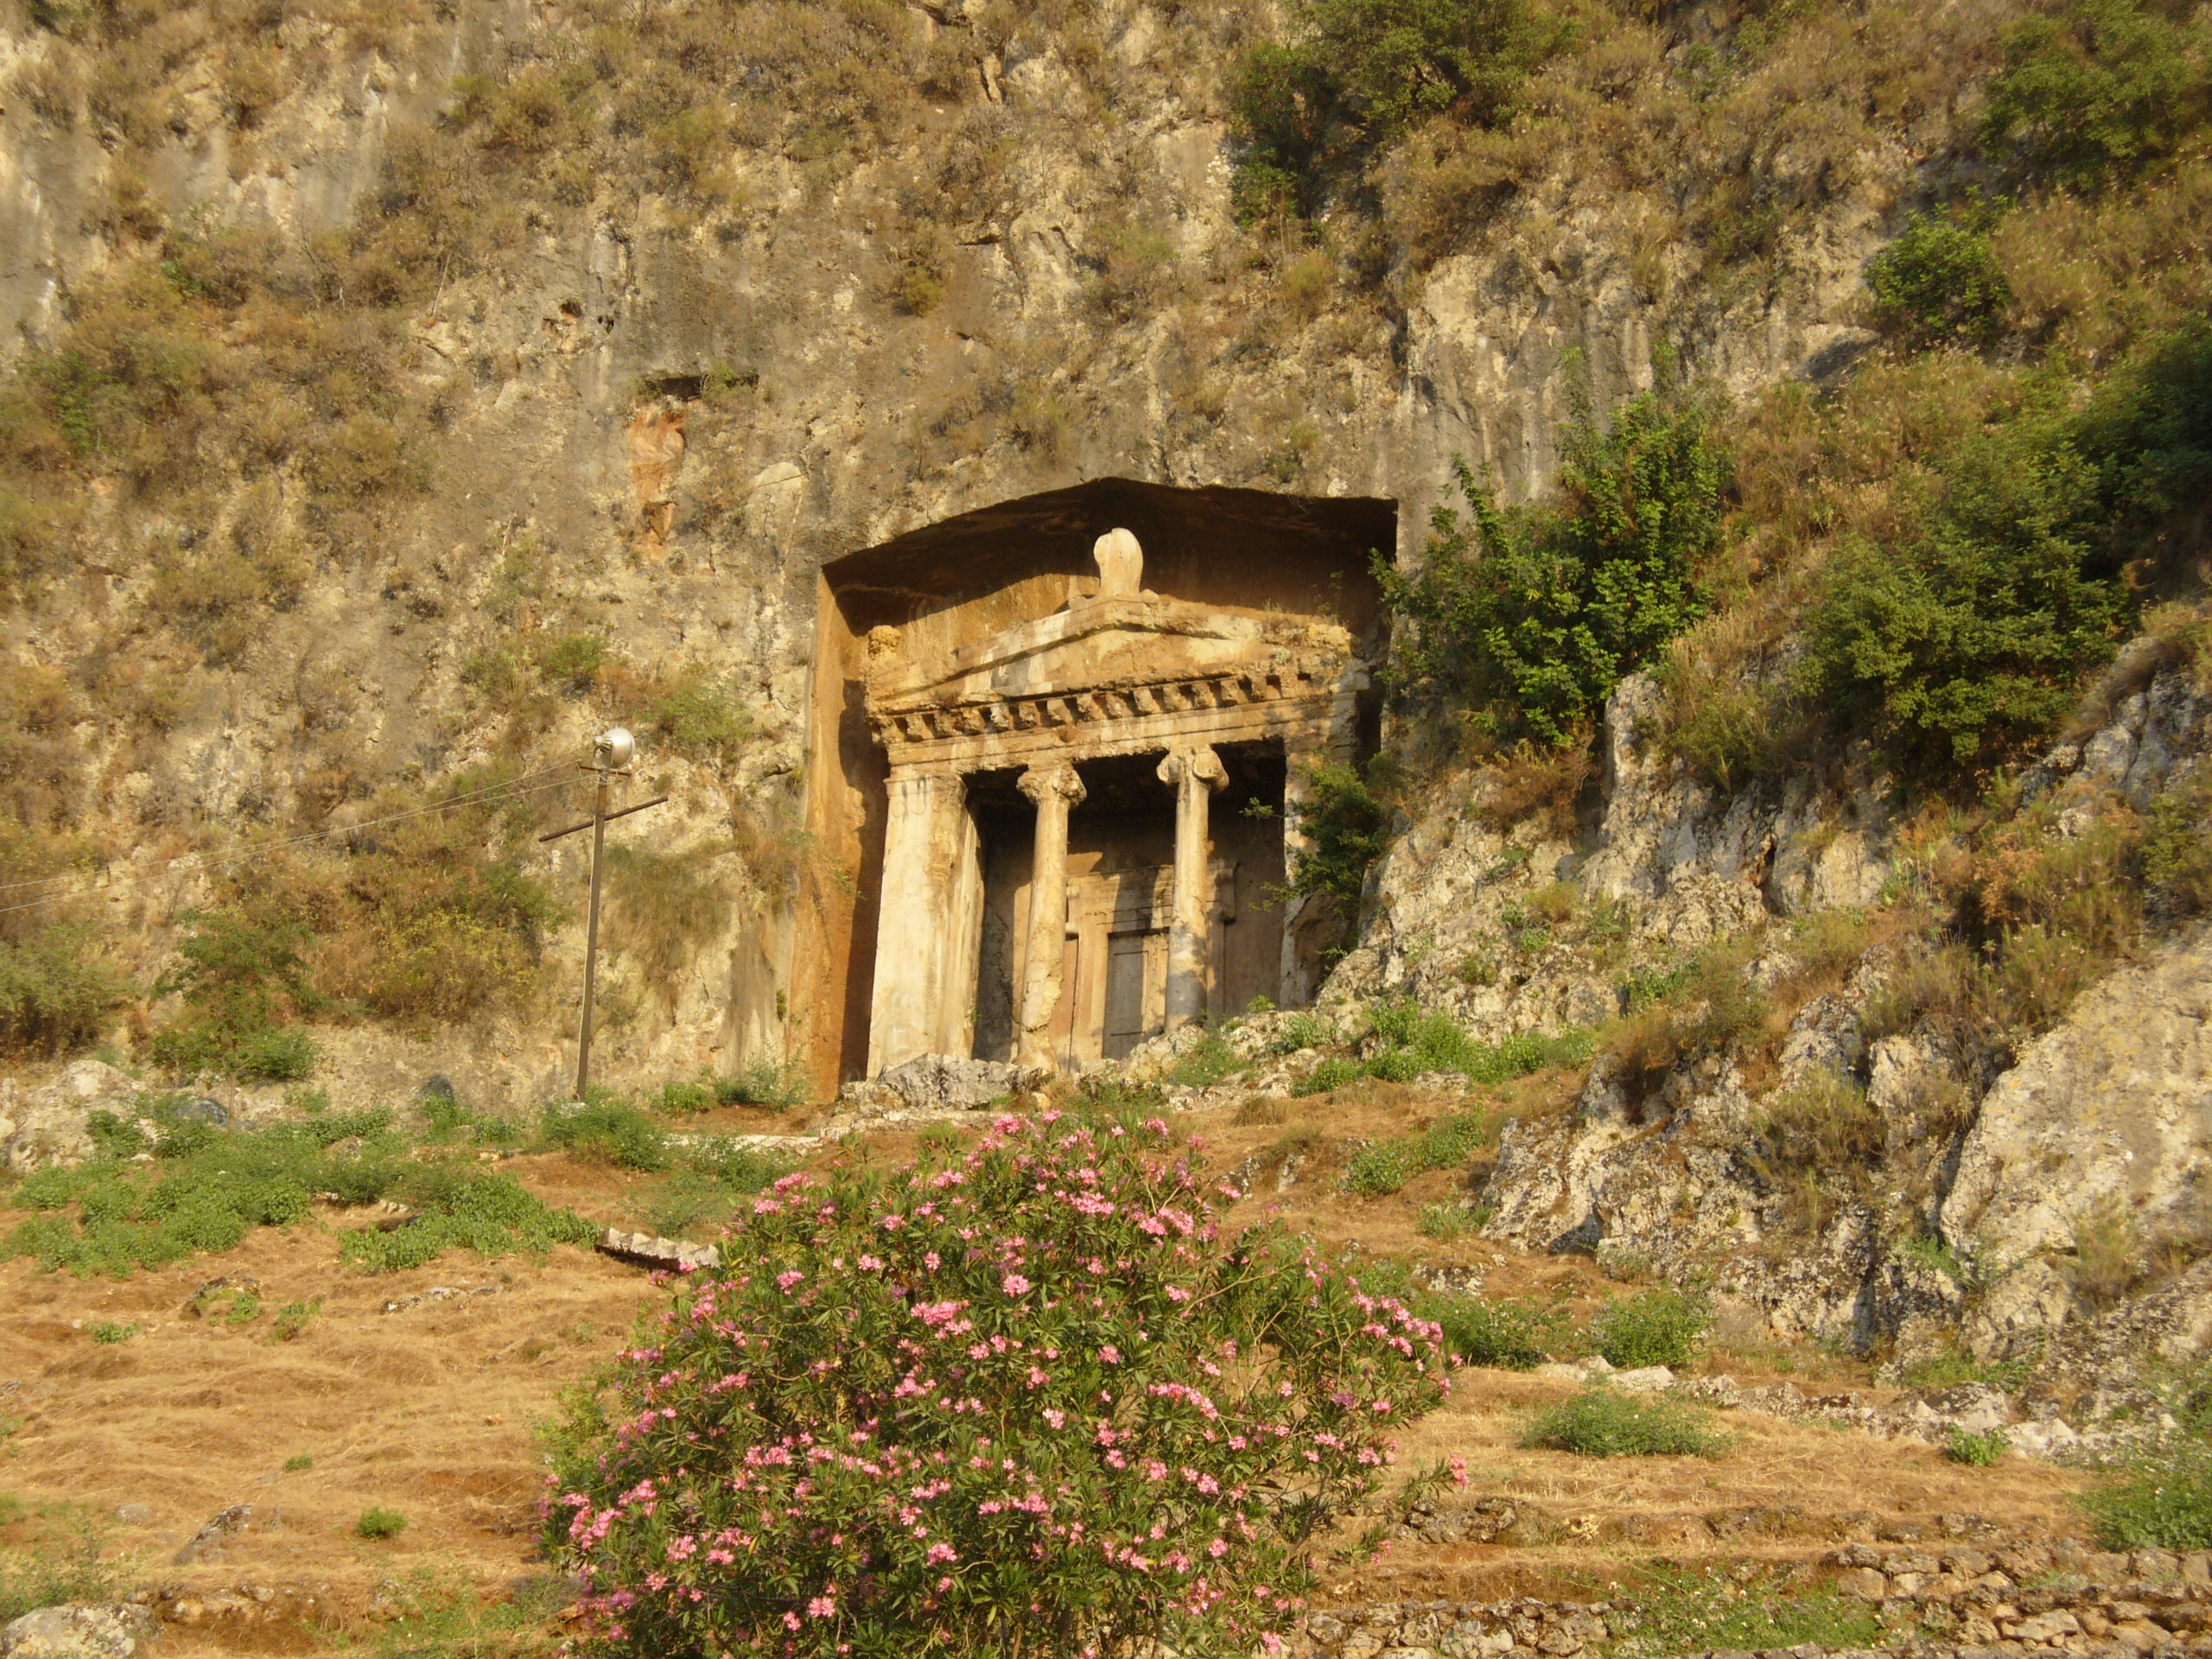 File:Tomb of Amyntas.jpg - Wikimedia Commons